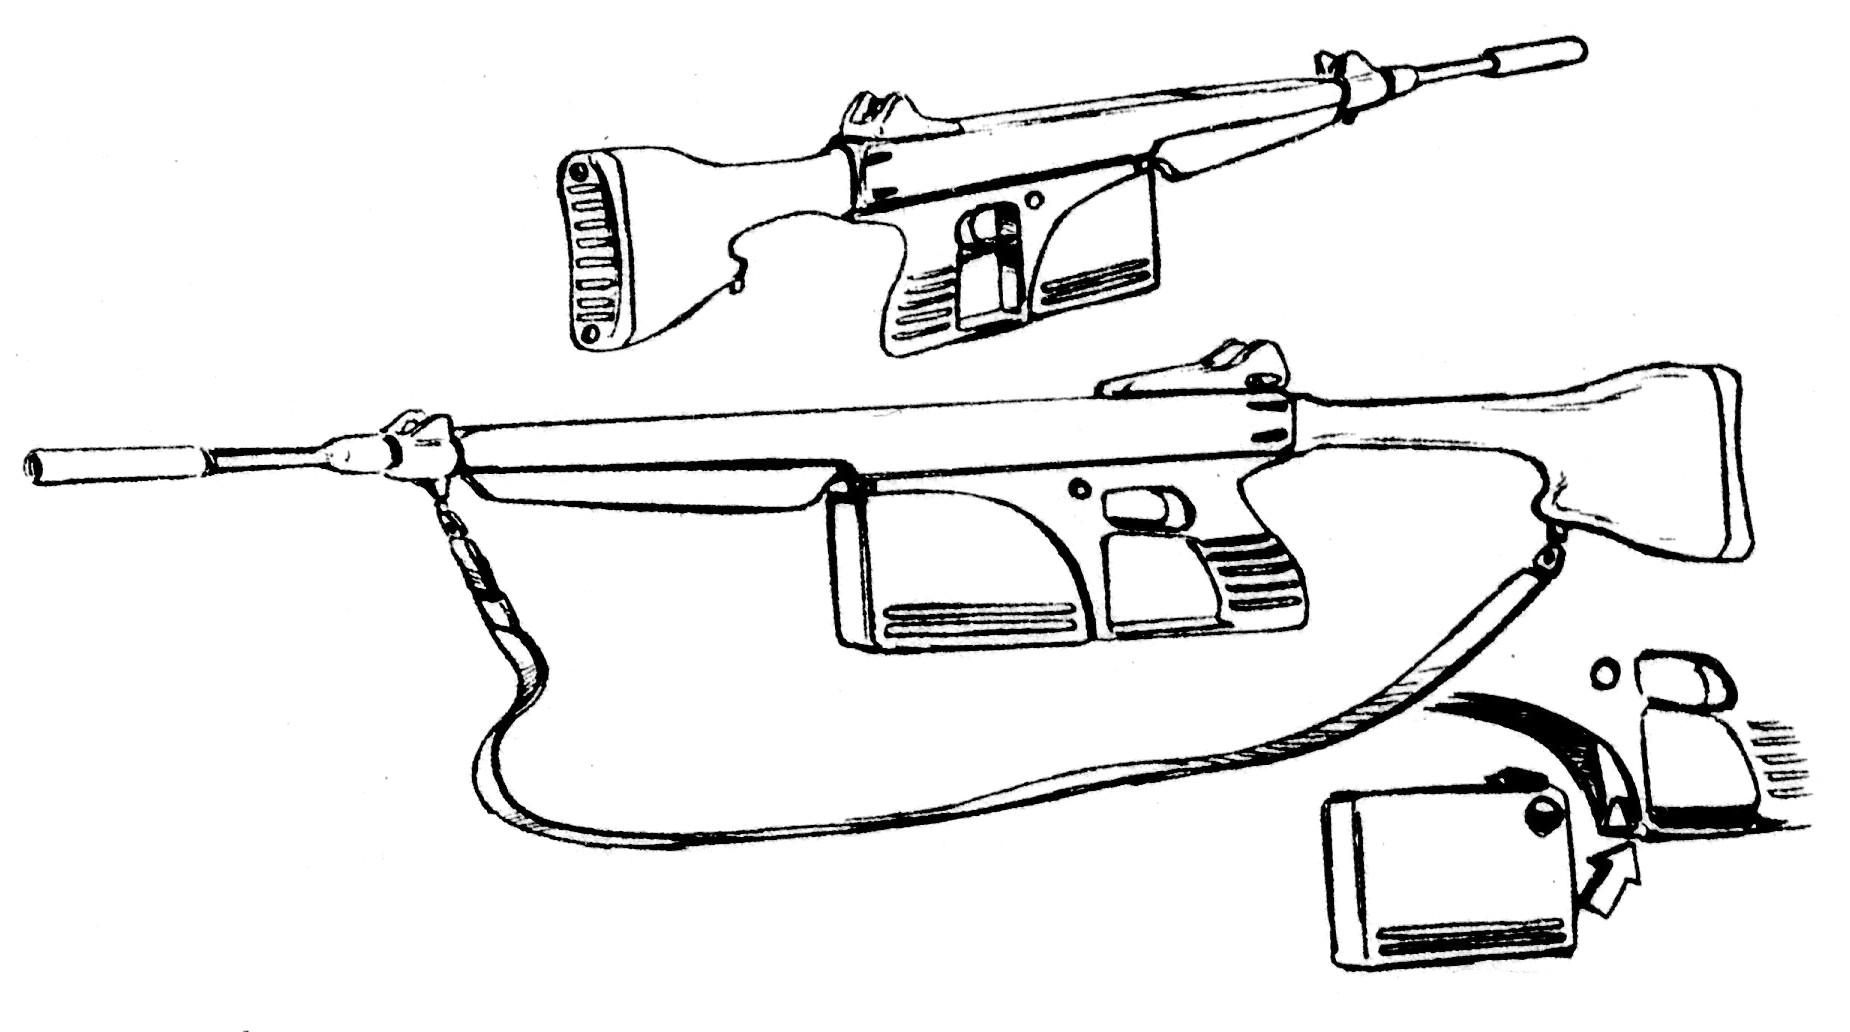 Armelite Colt Ar 21 5 56mm Assault Rifle Gallery